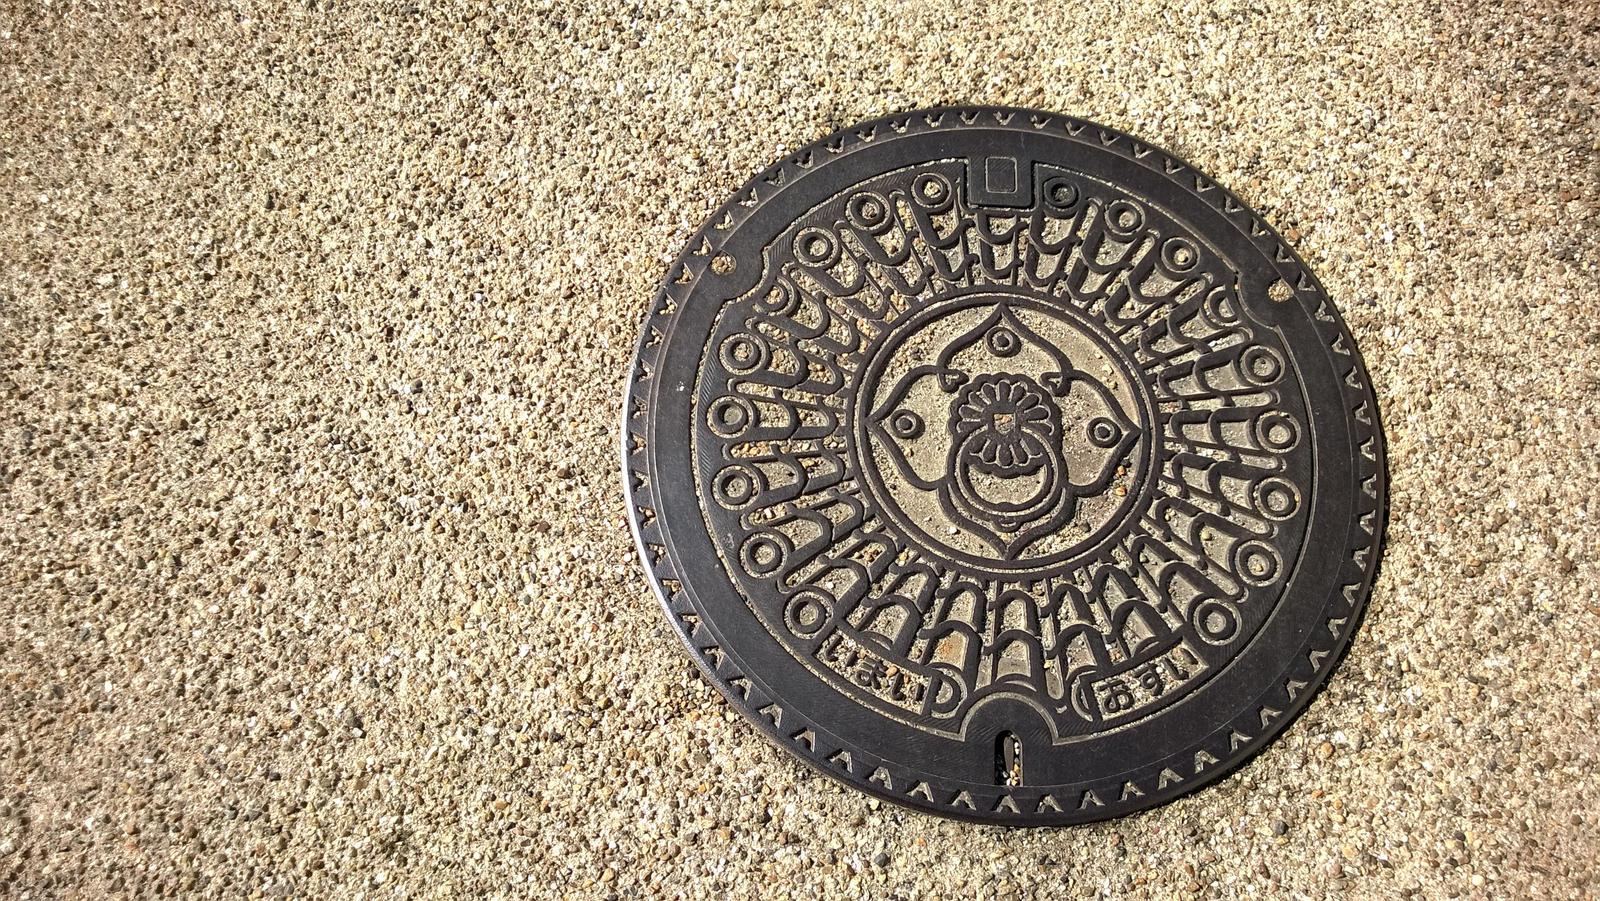 Artistic manhole by Fukuchan-Ryoko